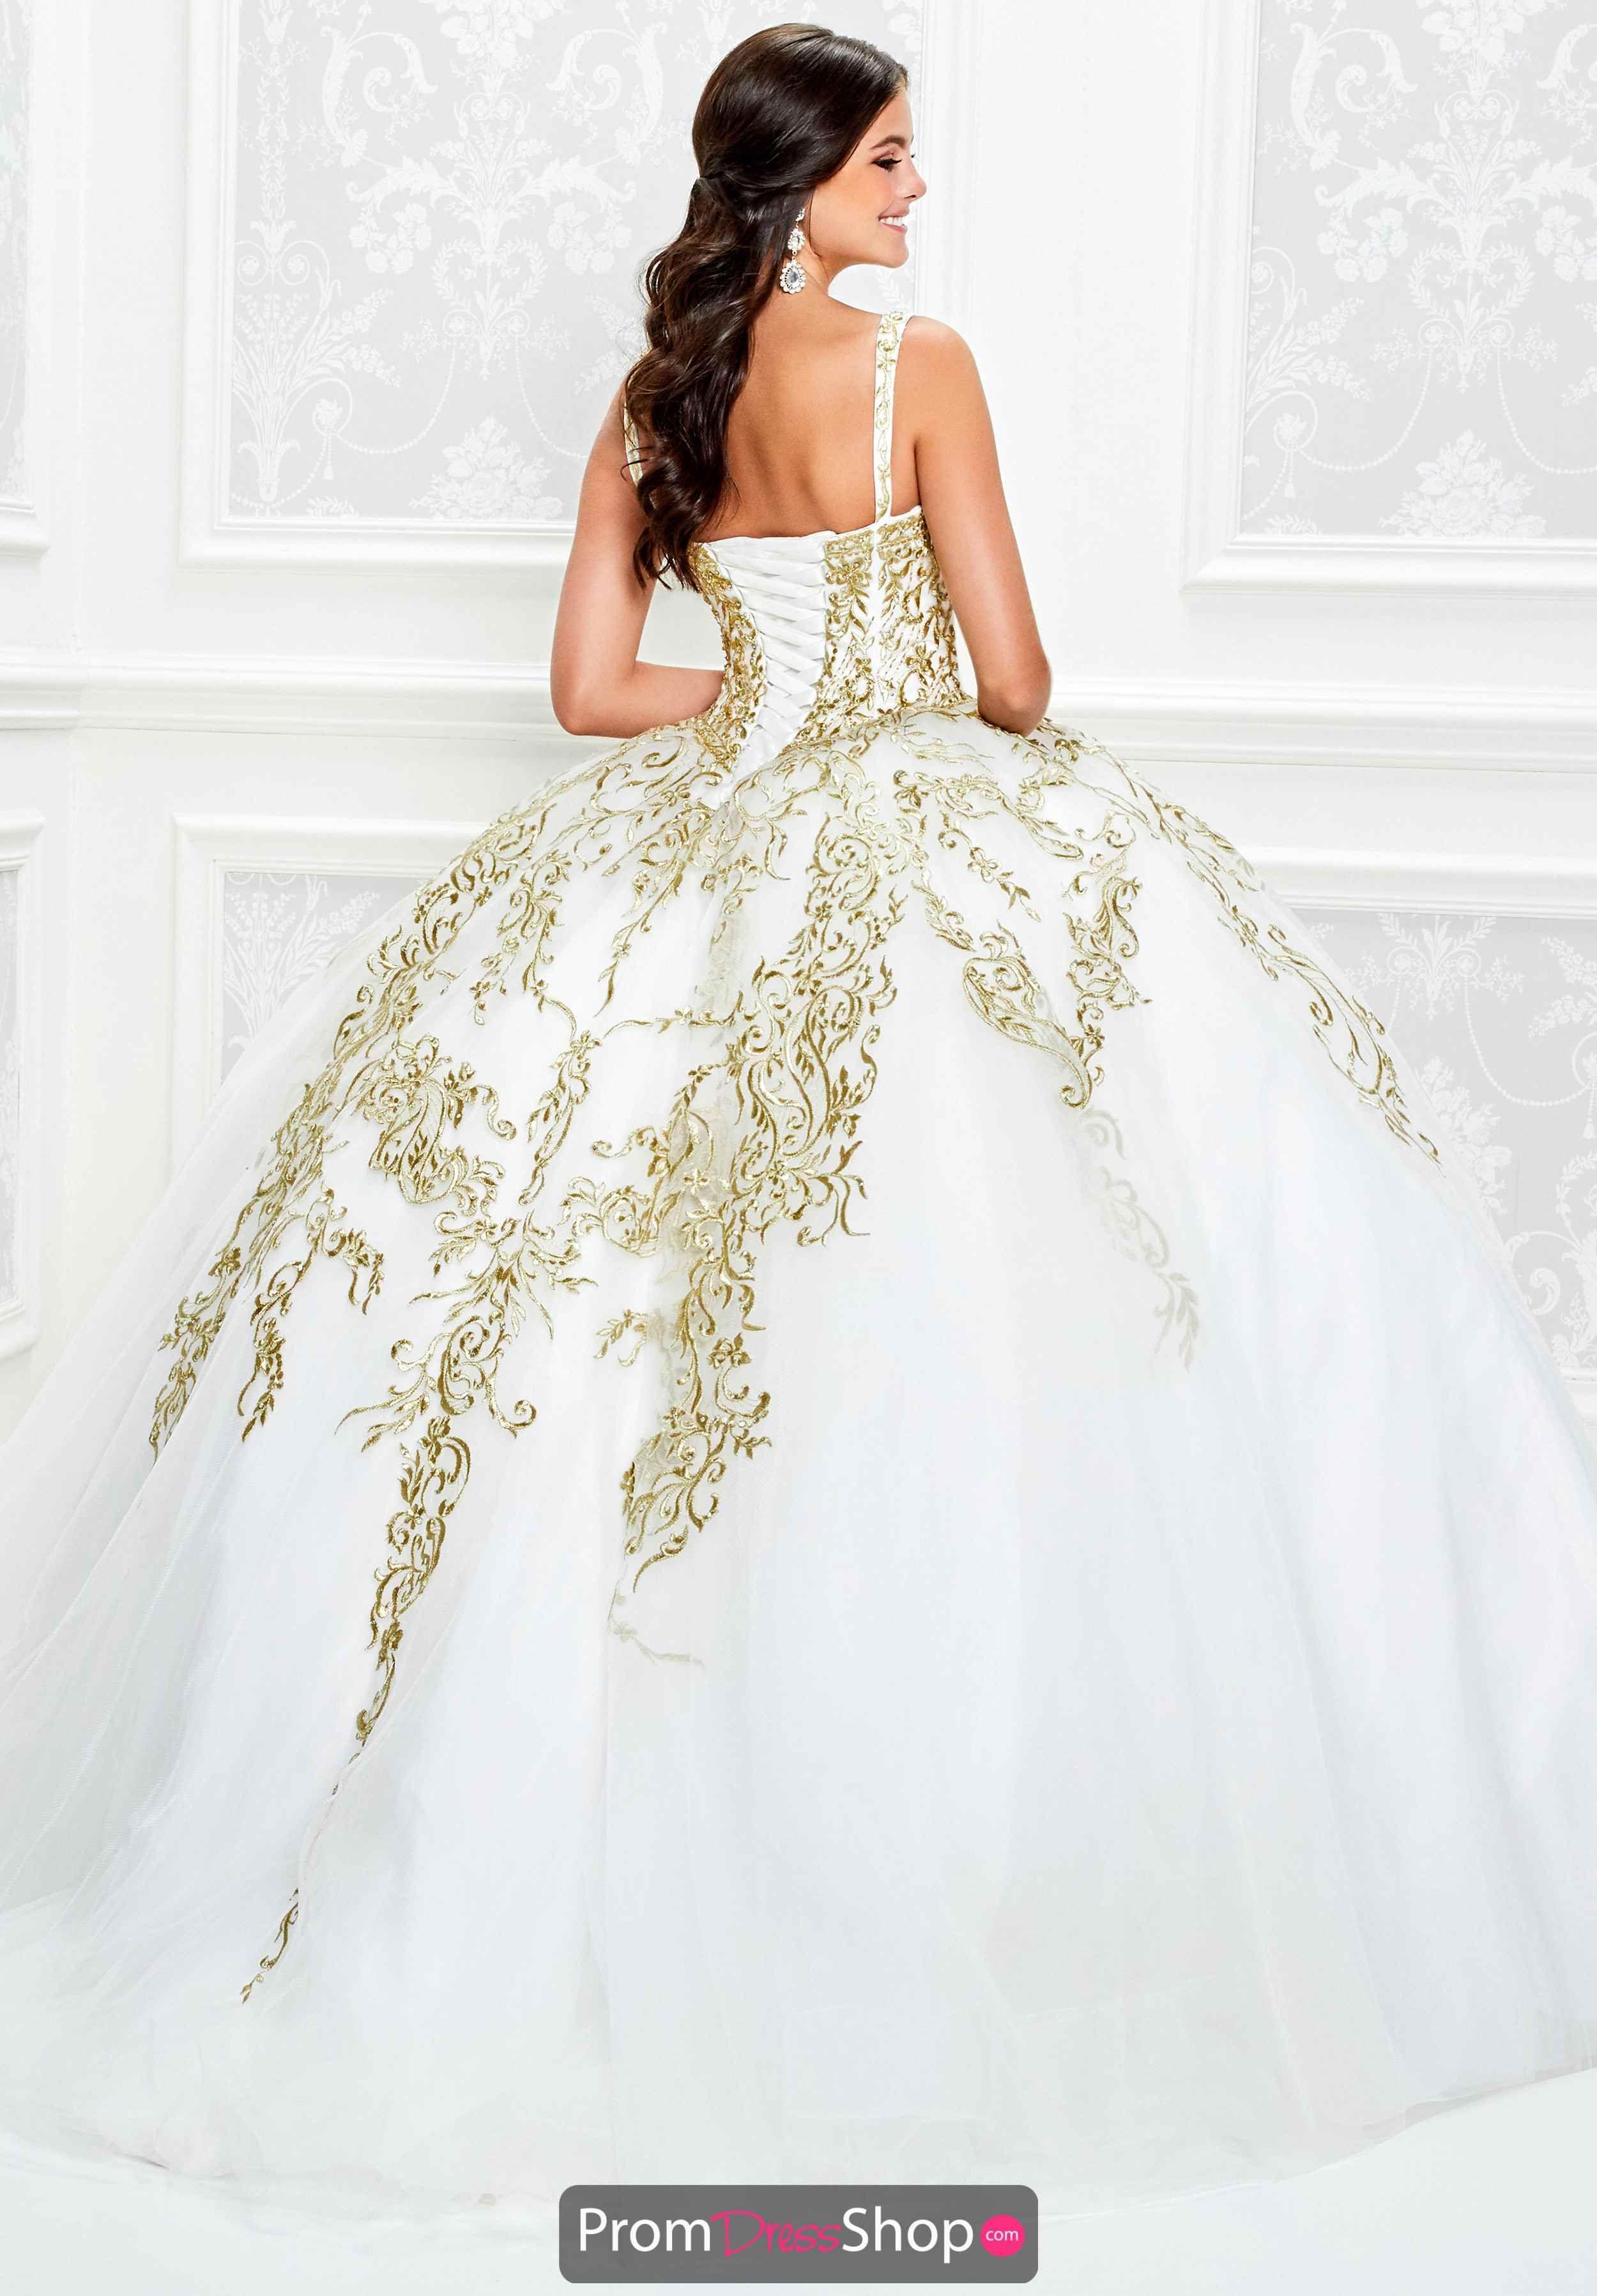 Princesa Dress Pr11924 Promdressshop Com Vestidos De Quinceanera Xv Vestidos Vestidos Bonitos [ 3595 x 2500 Pixel ]